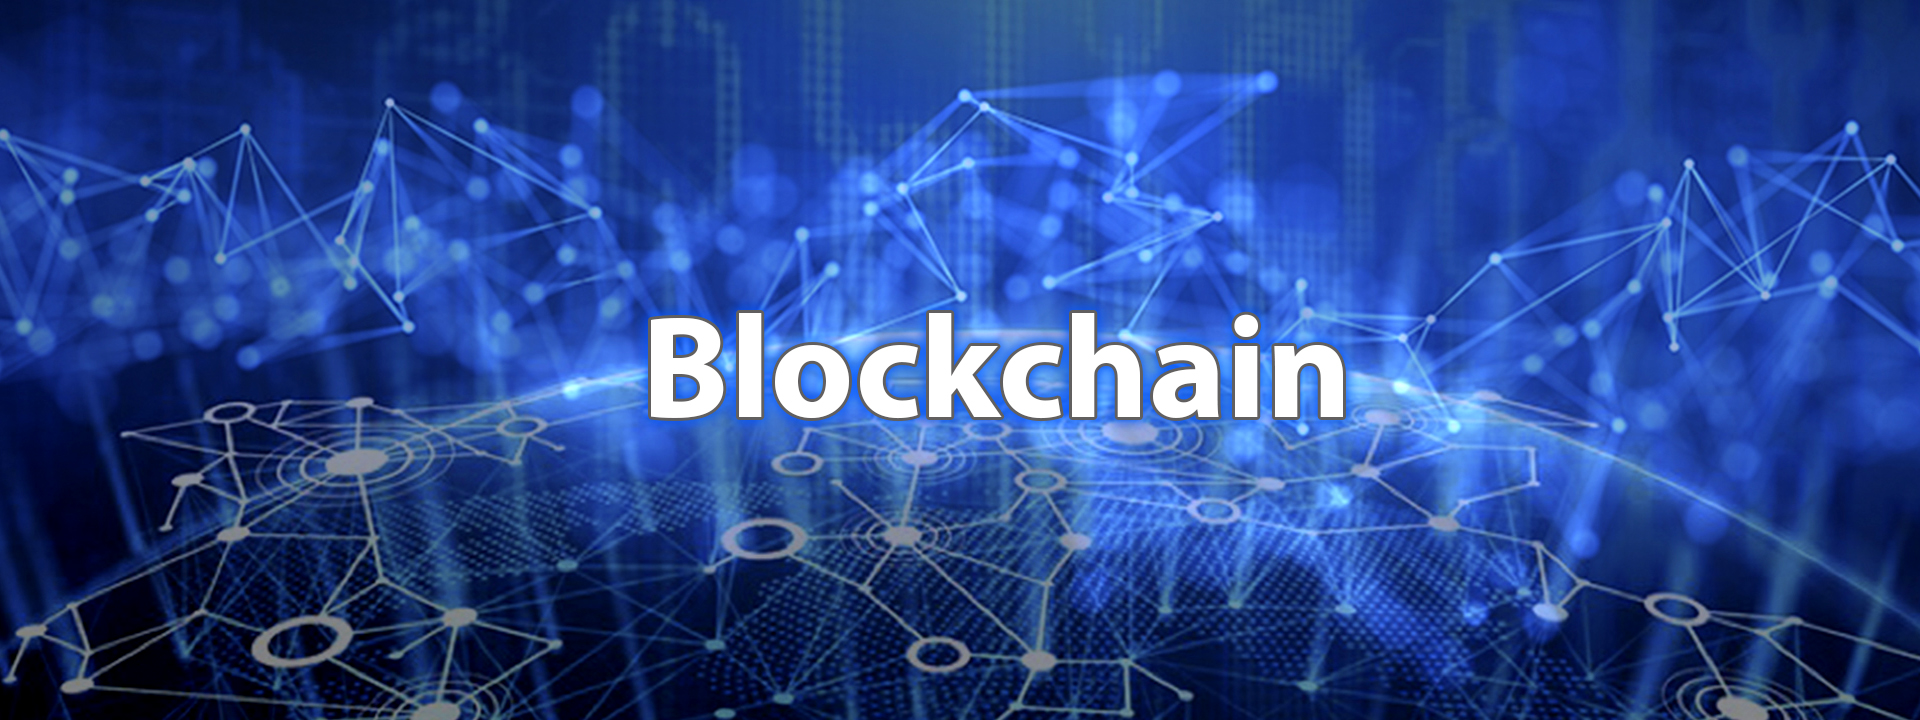 Blockchain nodos